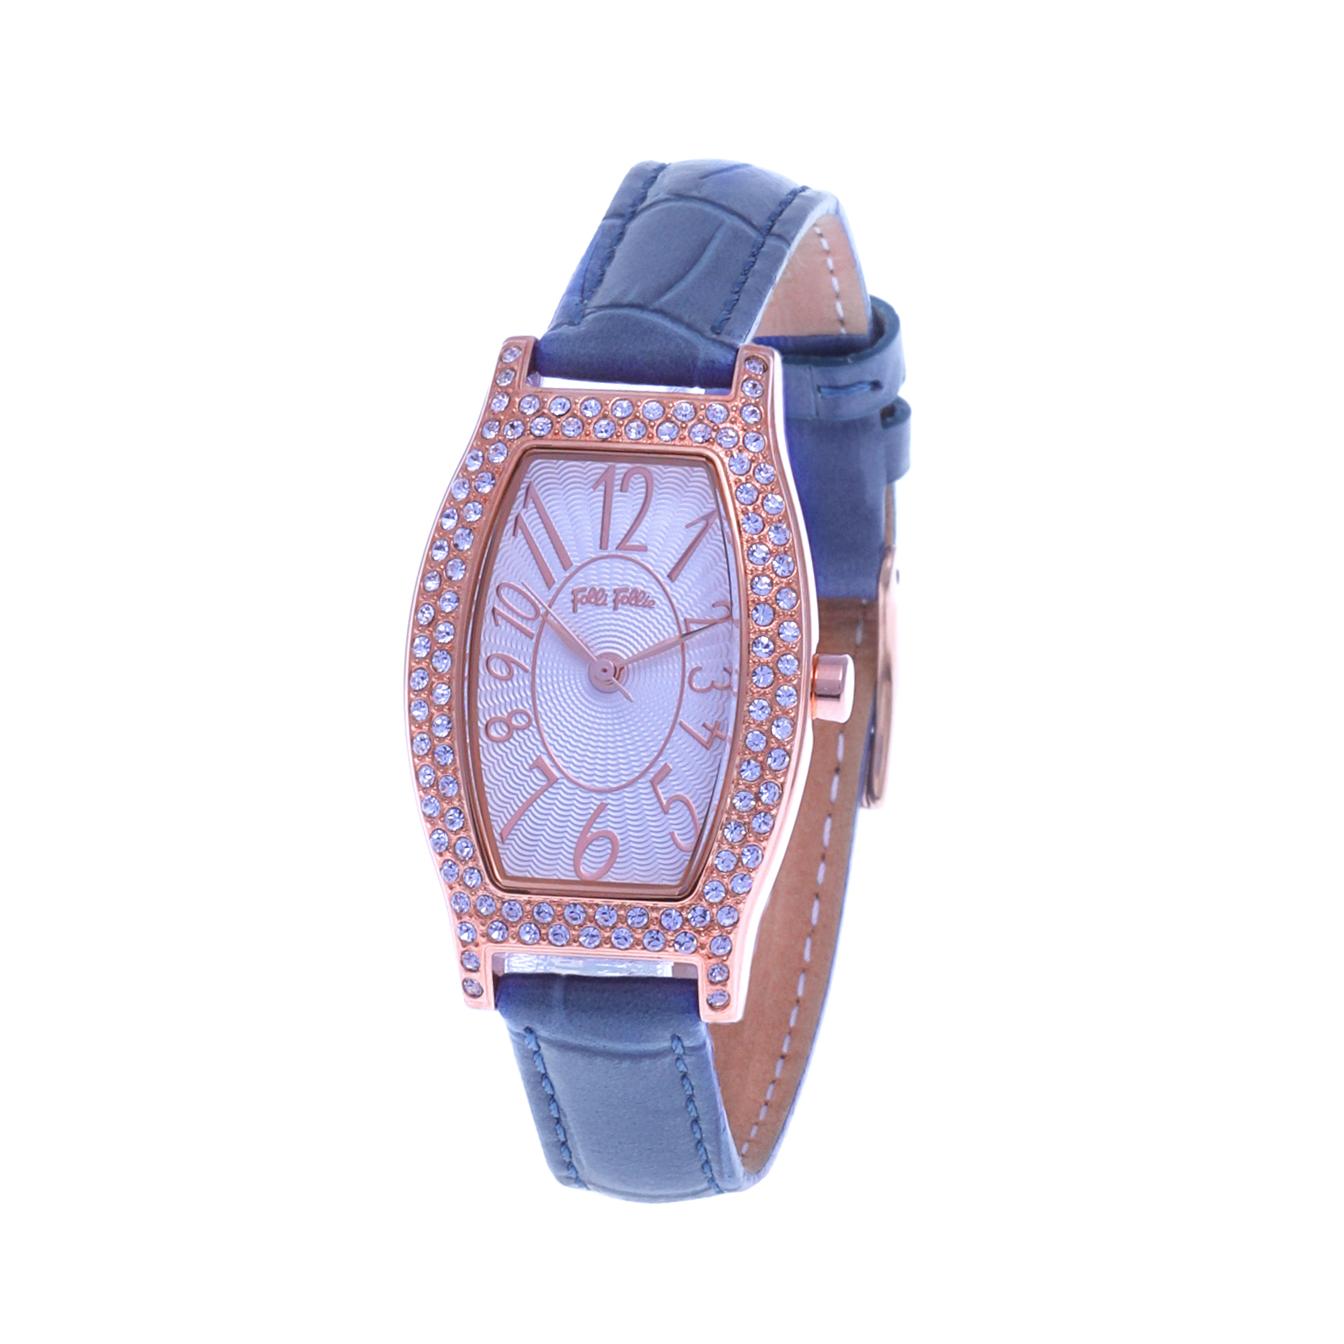 FOLLI FOLLIE – Γυναικείο ρολόι Folli Follie μπλε